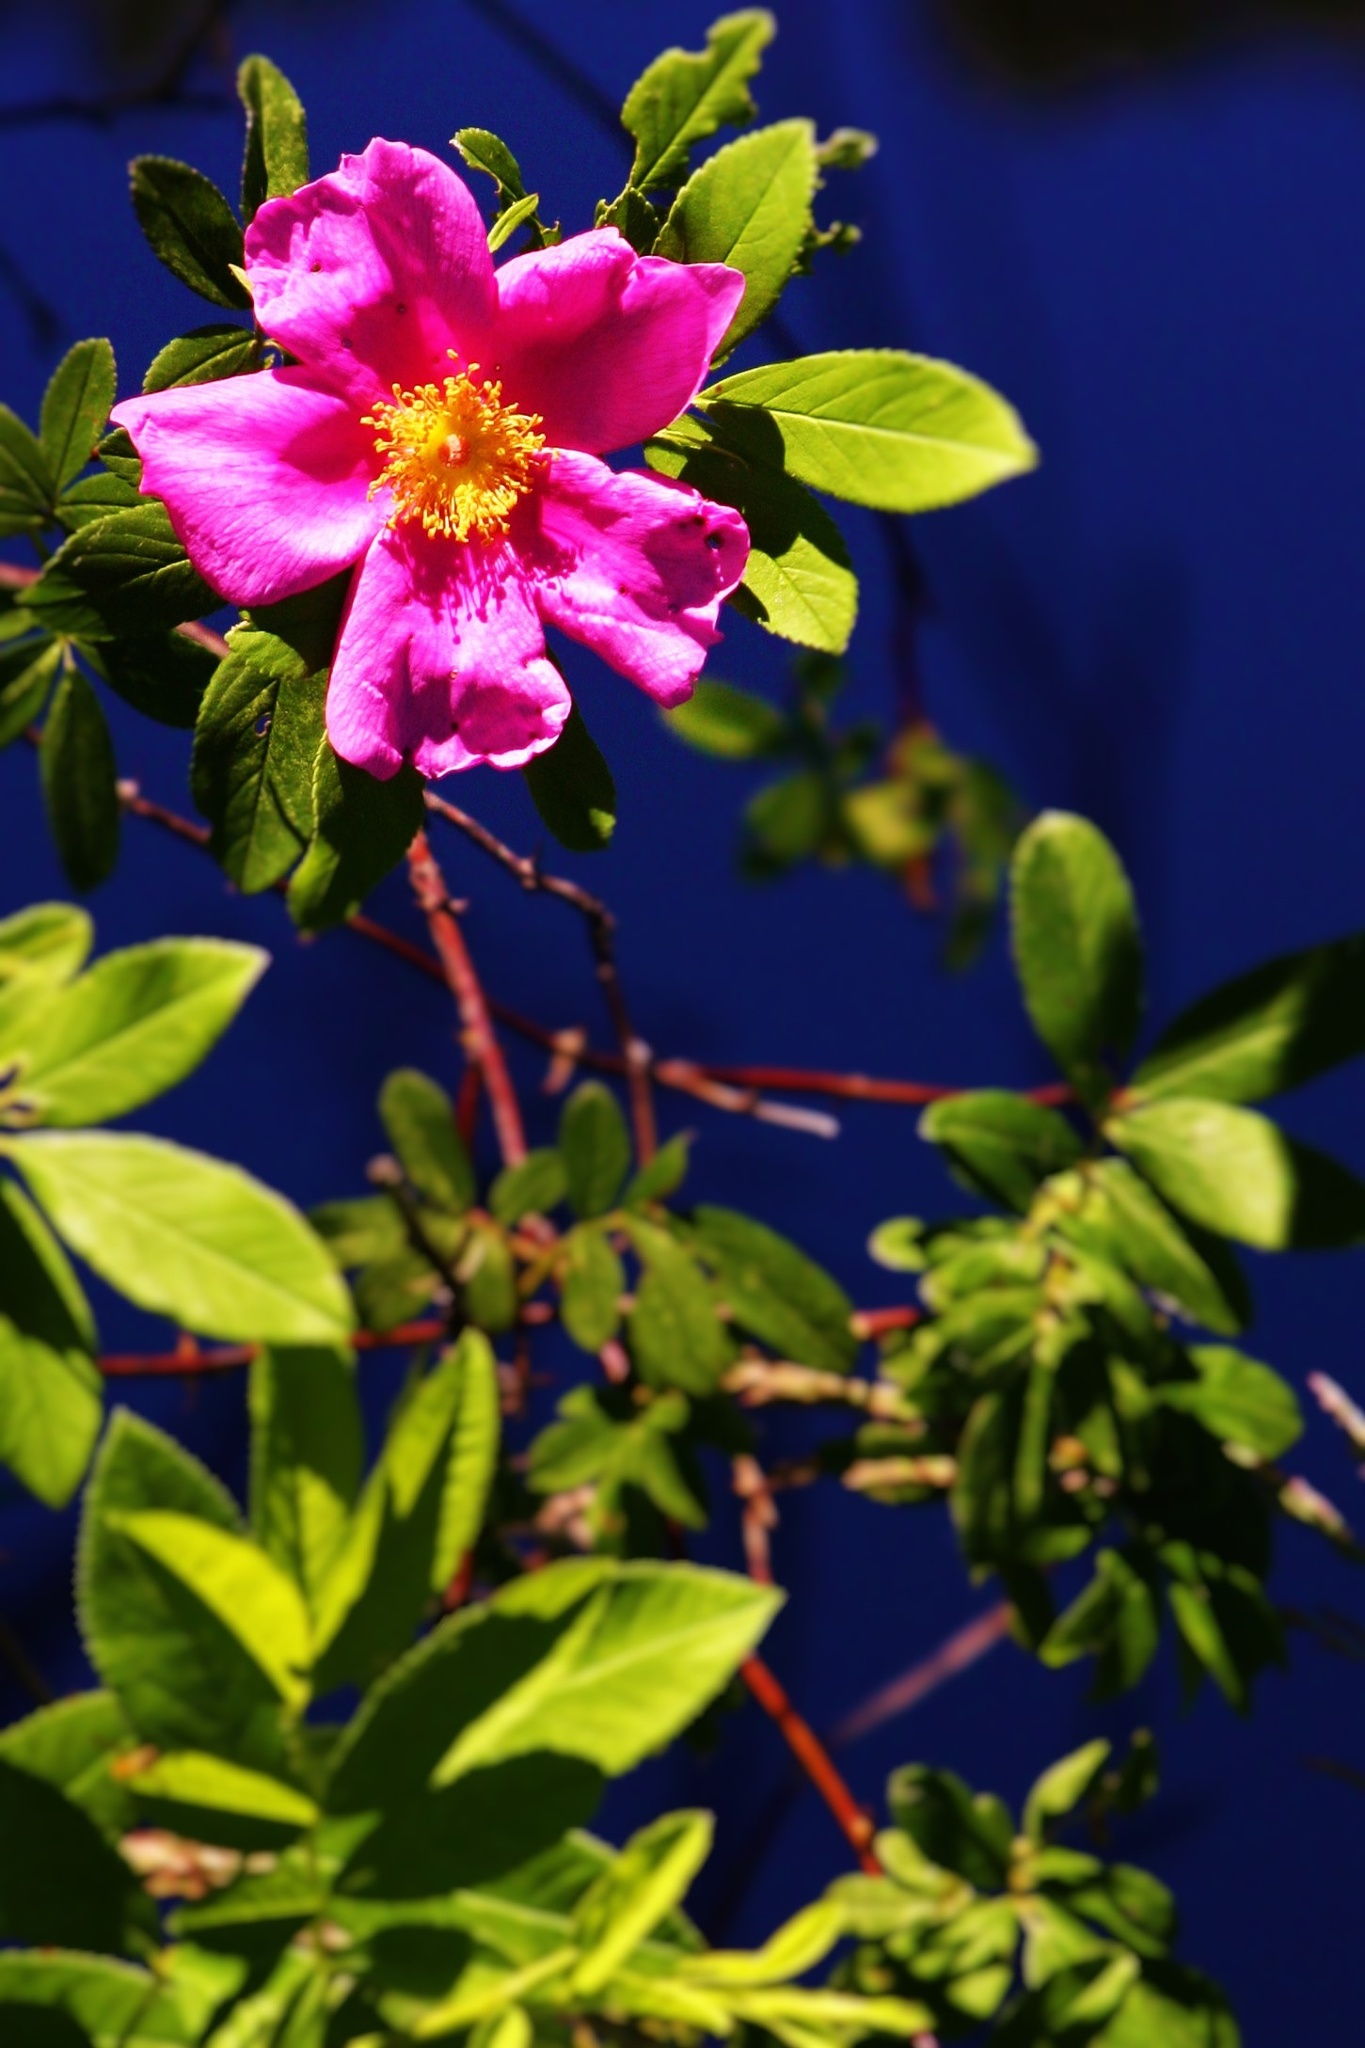 Wild Rose by  Houston Photography Studio